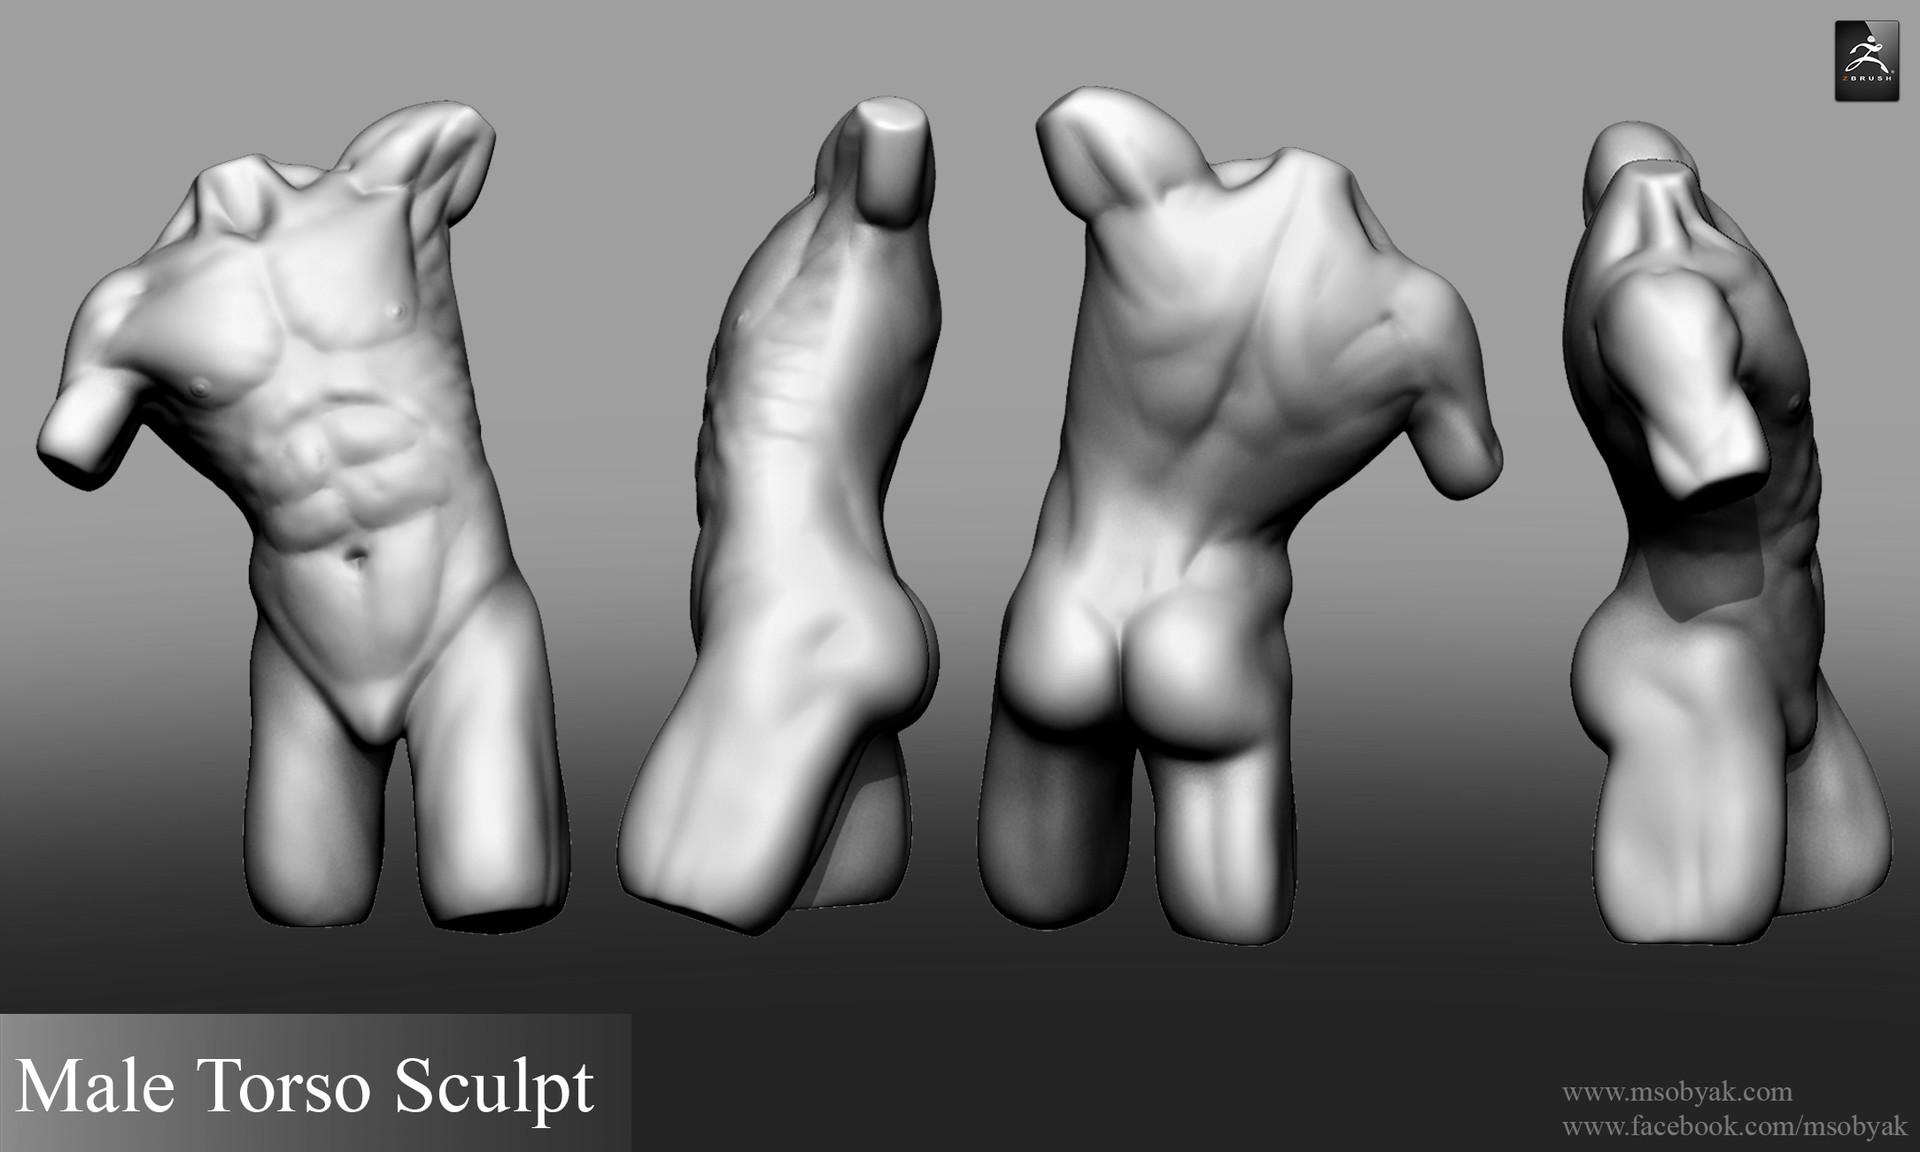 Michael Sobyak Male Torso Anatomy Sculpt